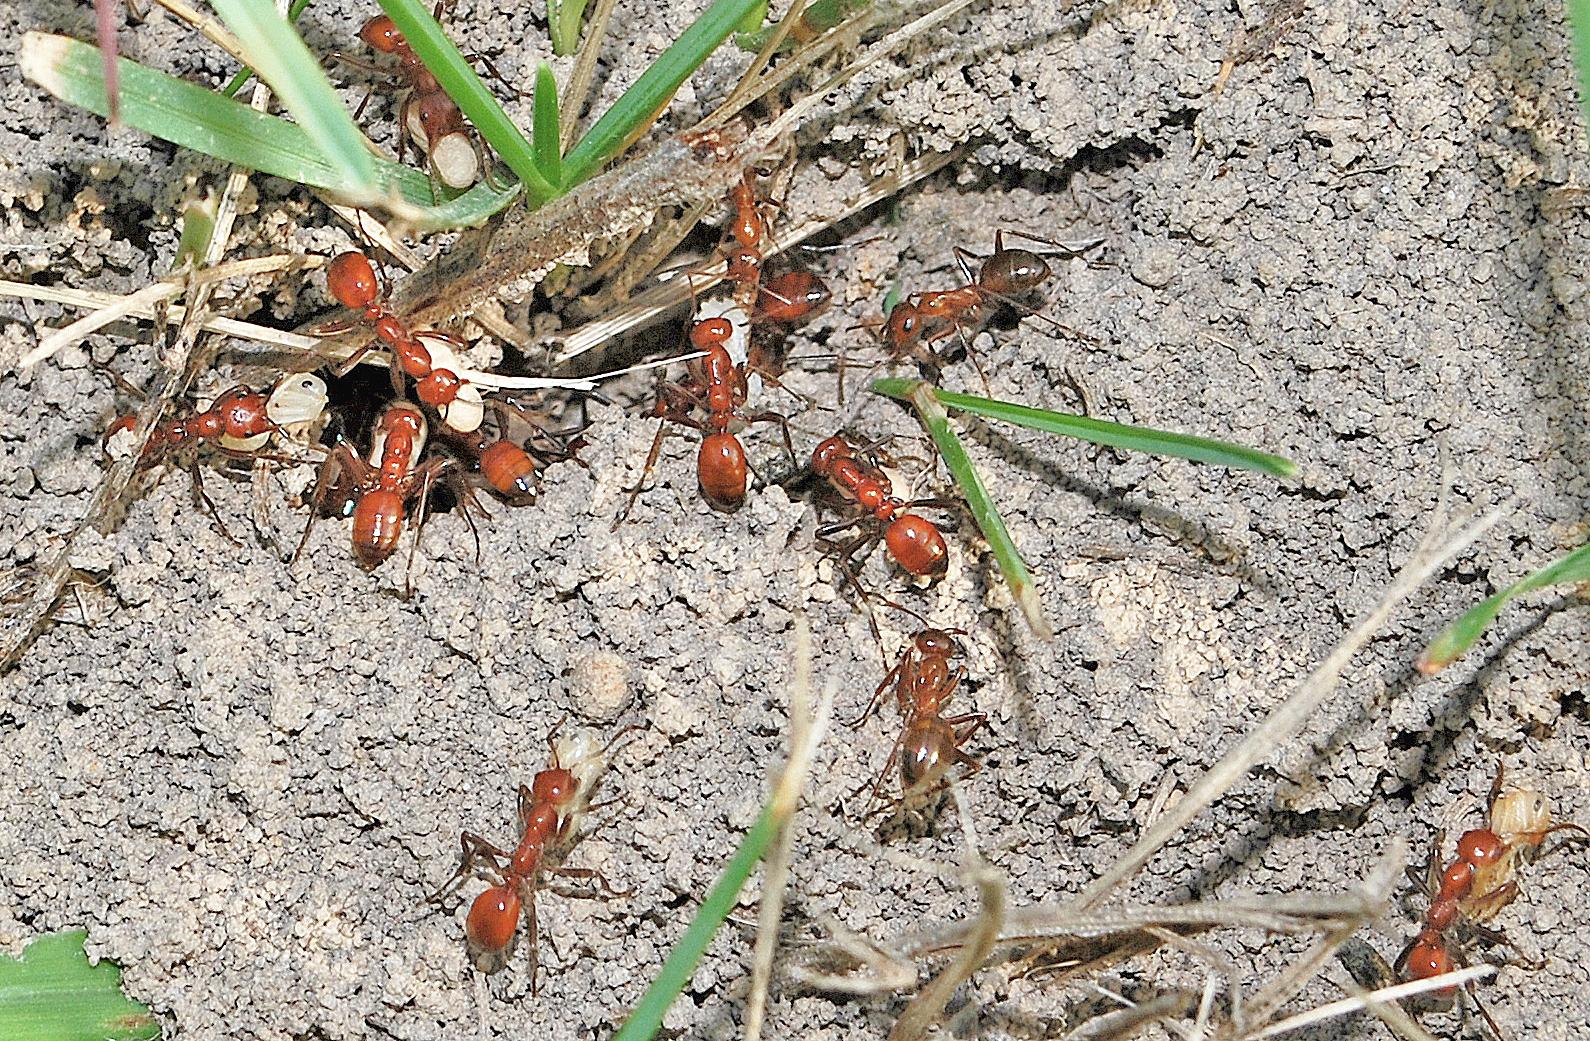 slavemaker ants